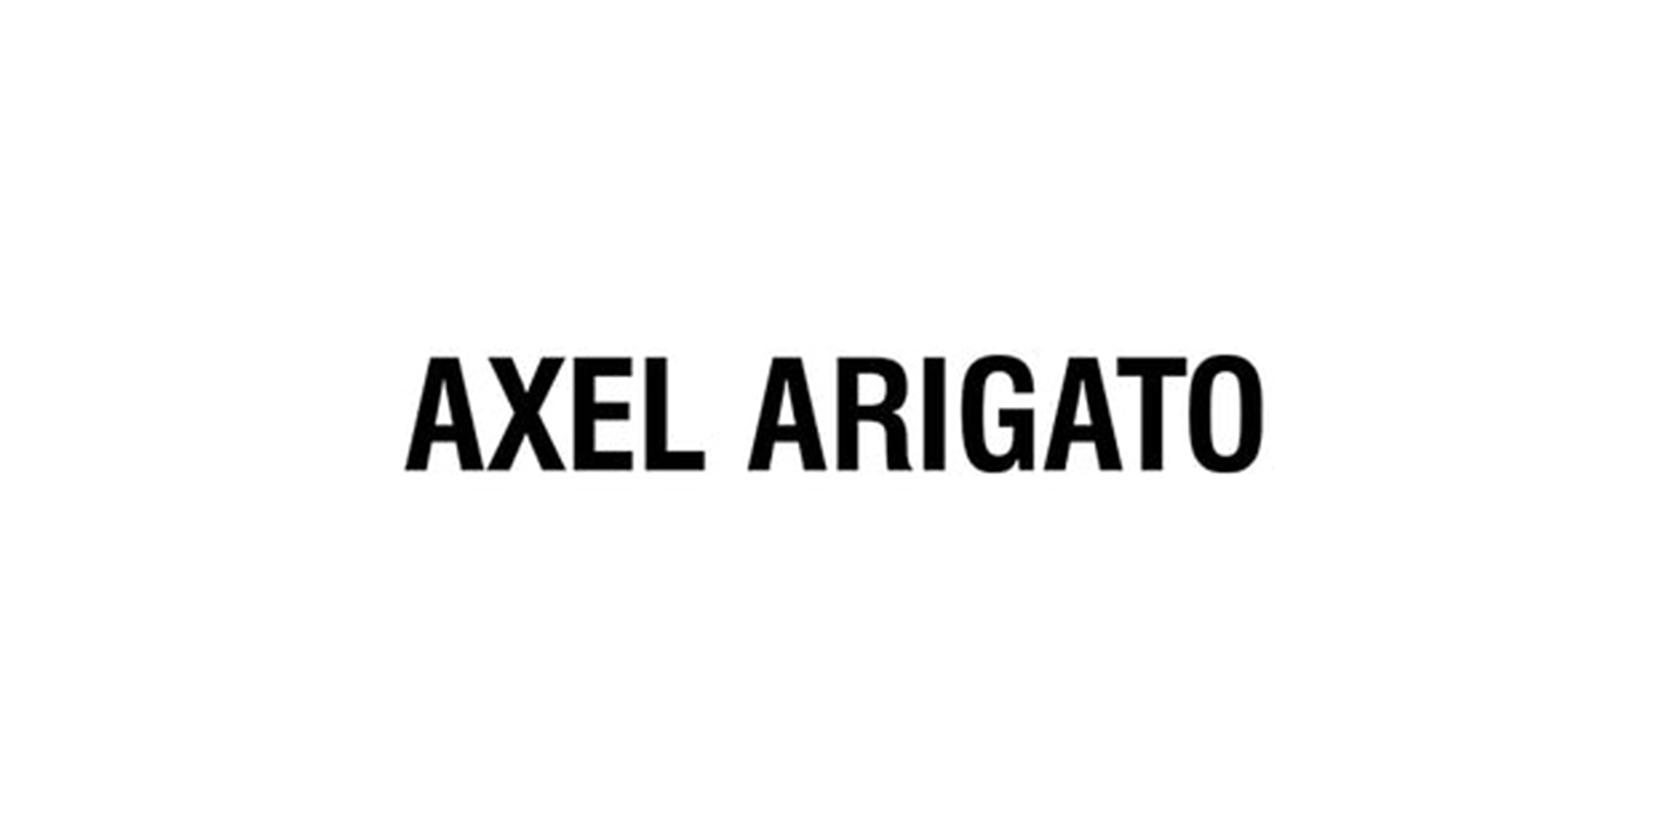 Axel Arigato